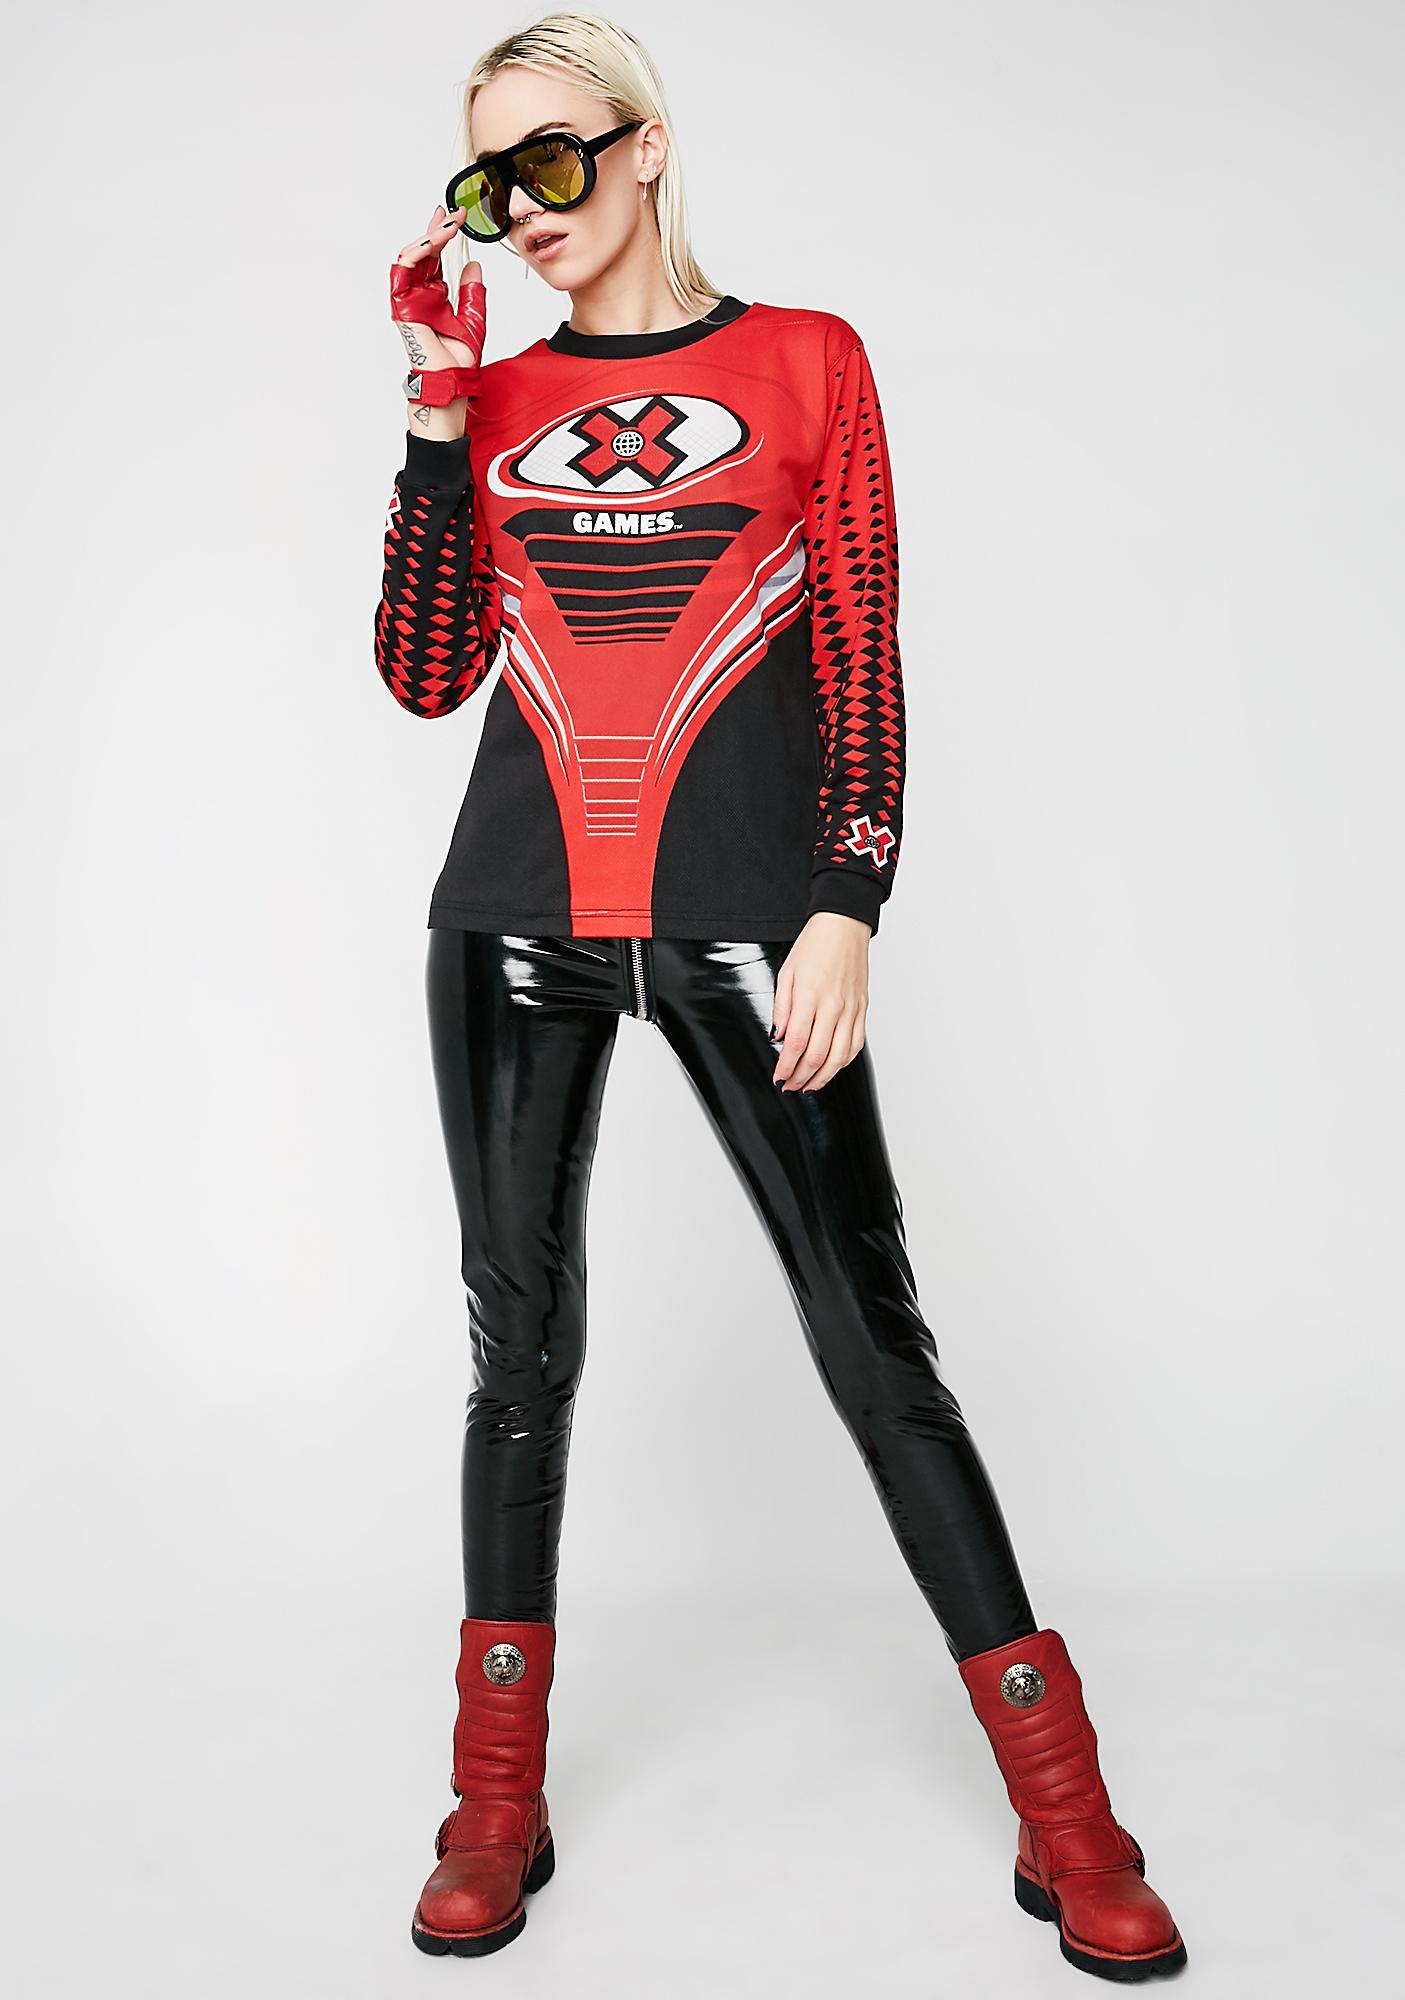 Vintage X Games Red Motocross Shirt